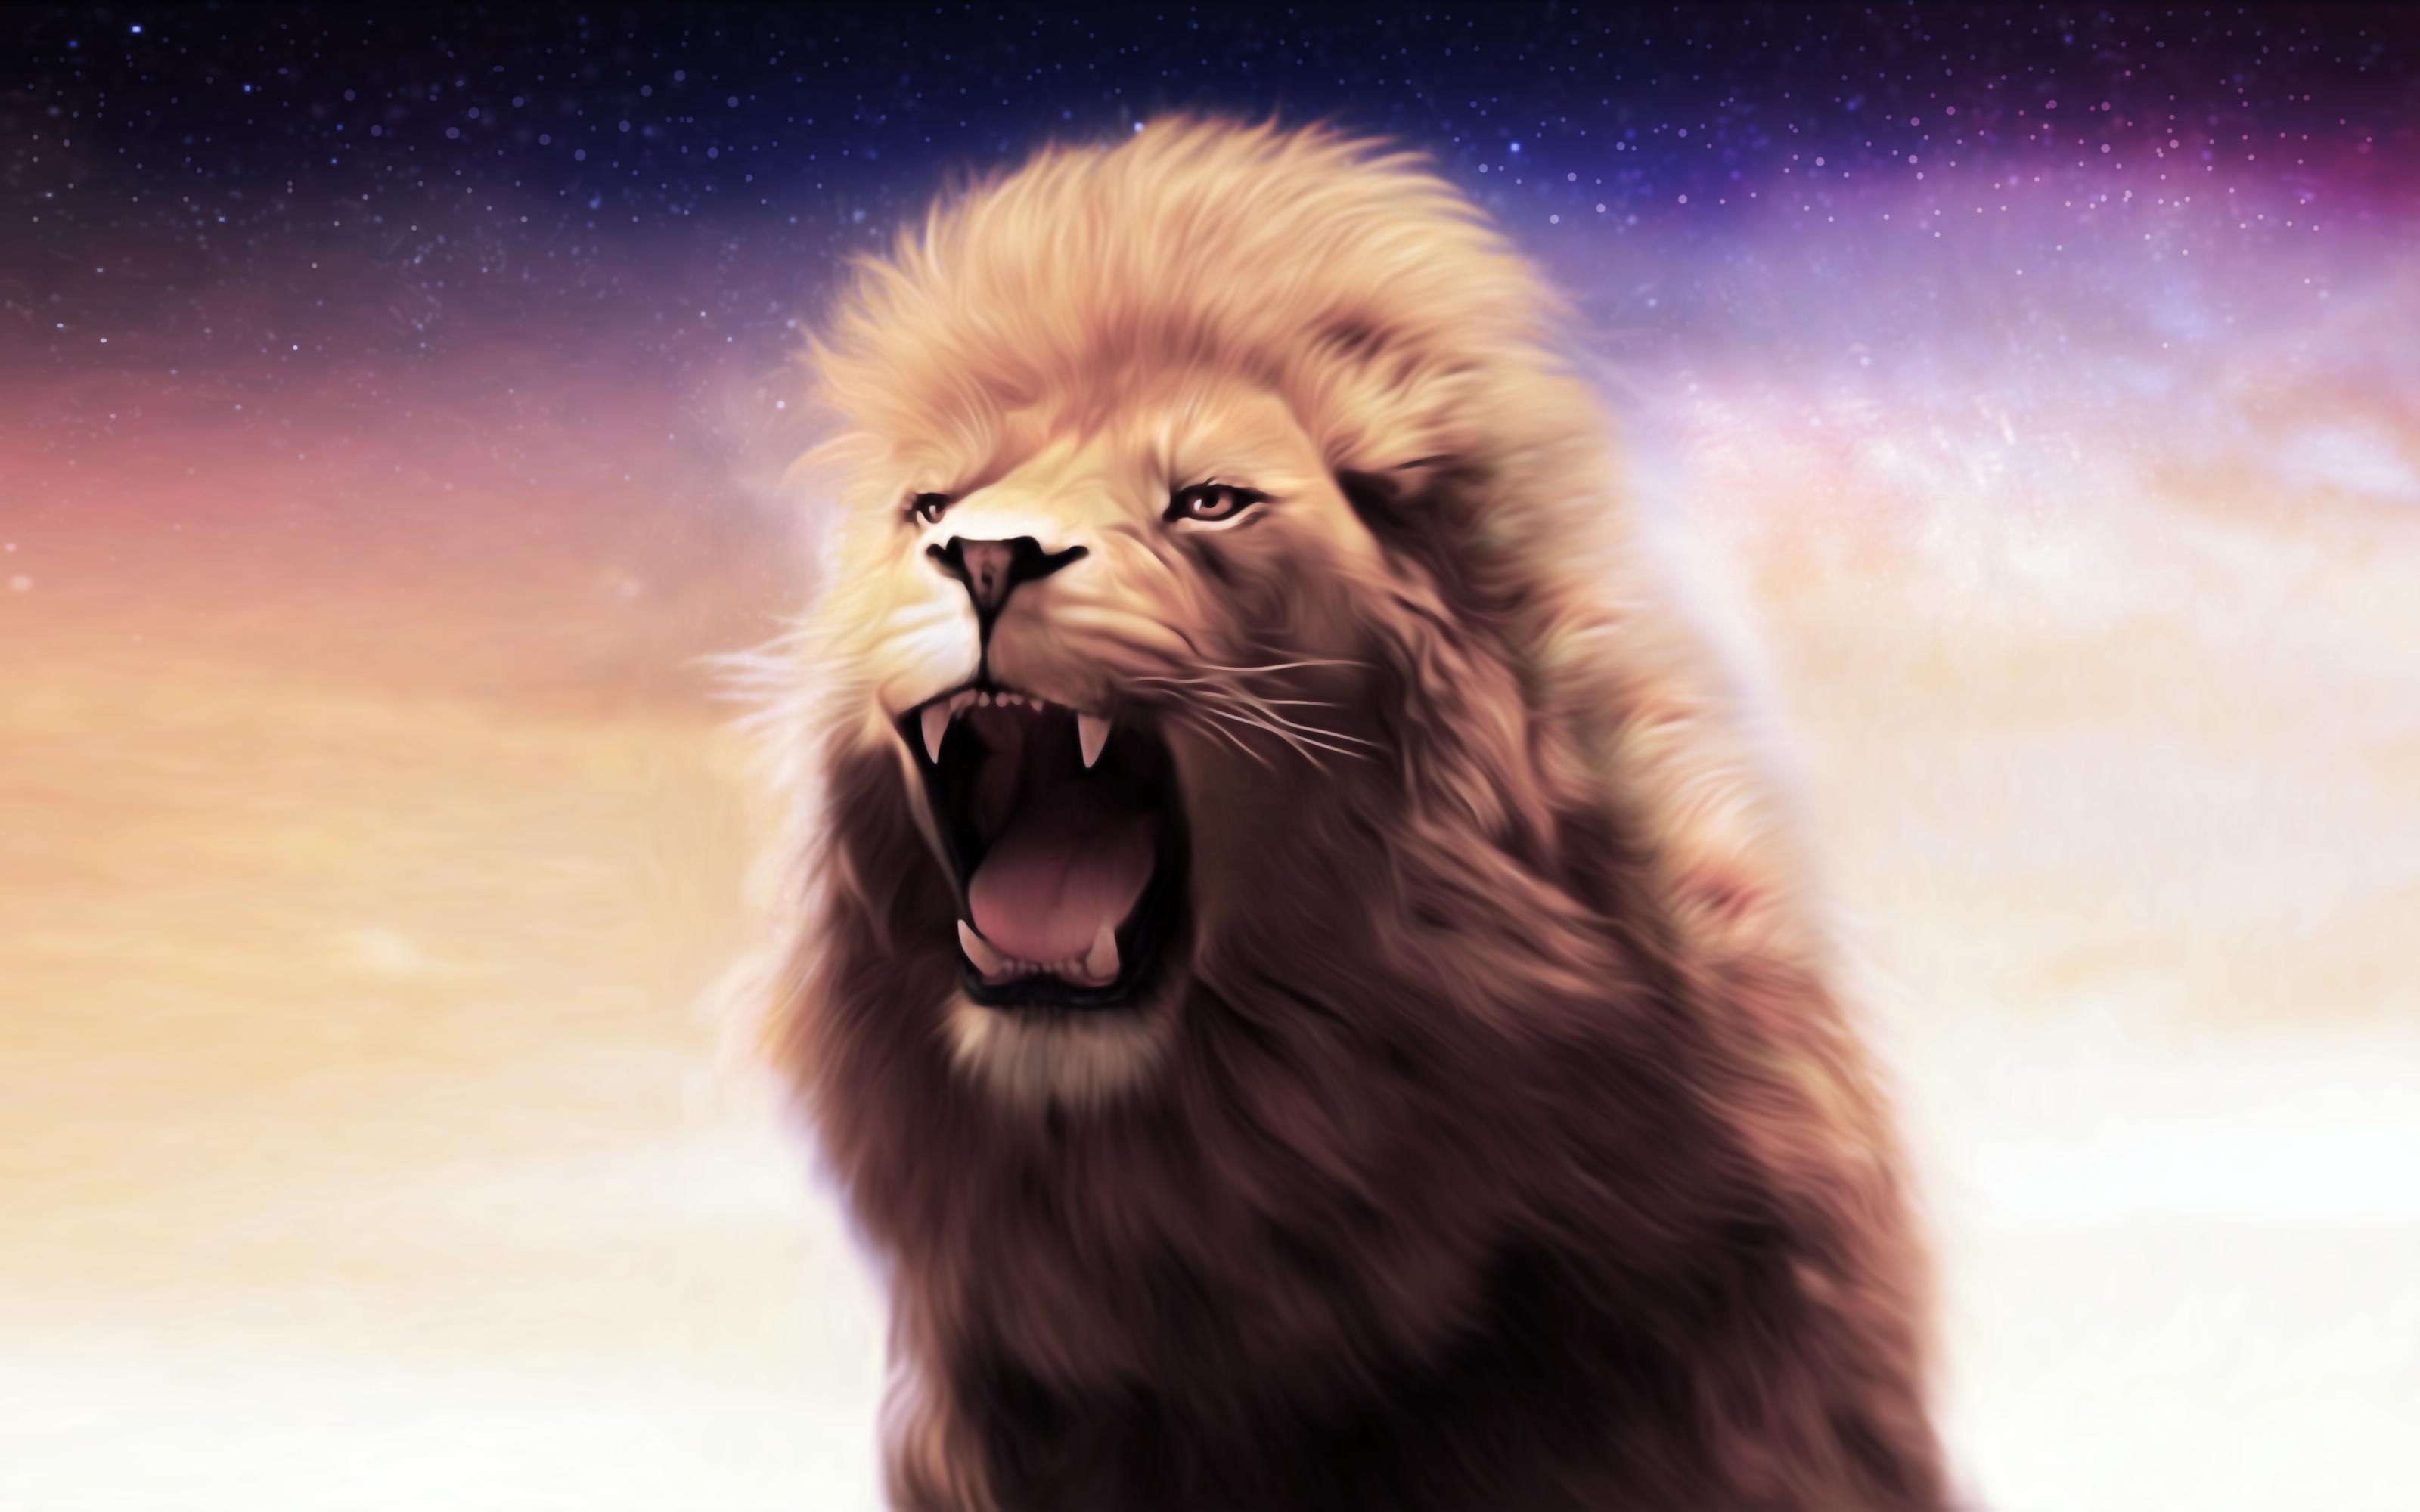 osx lion | wallpaper